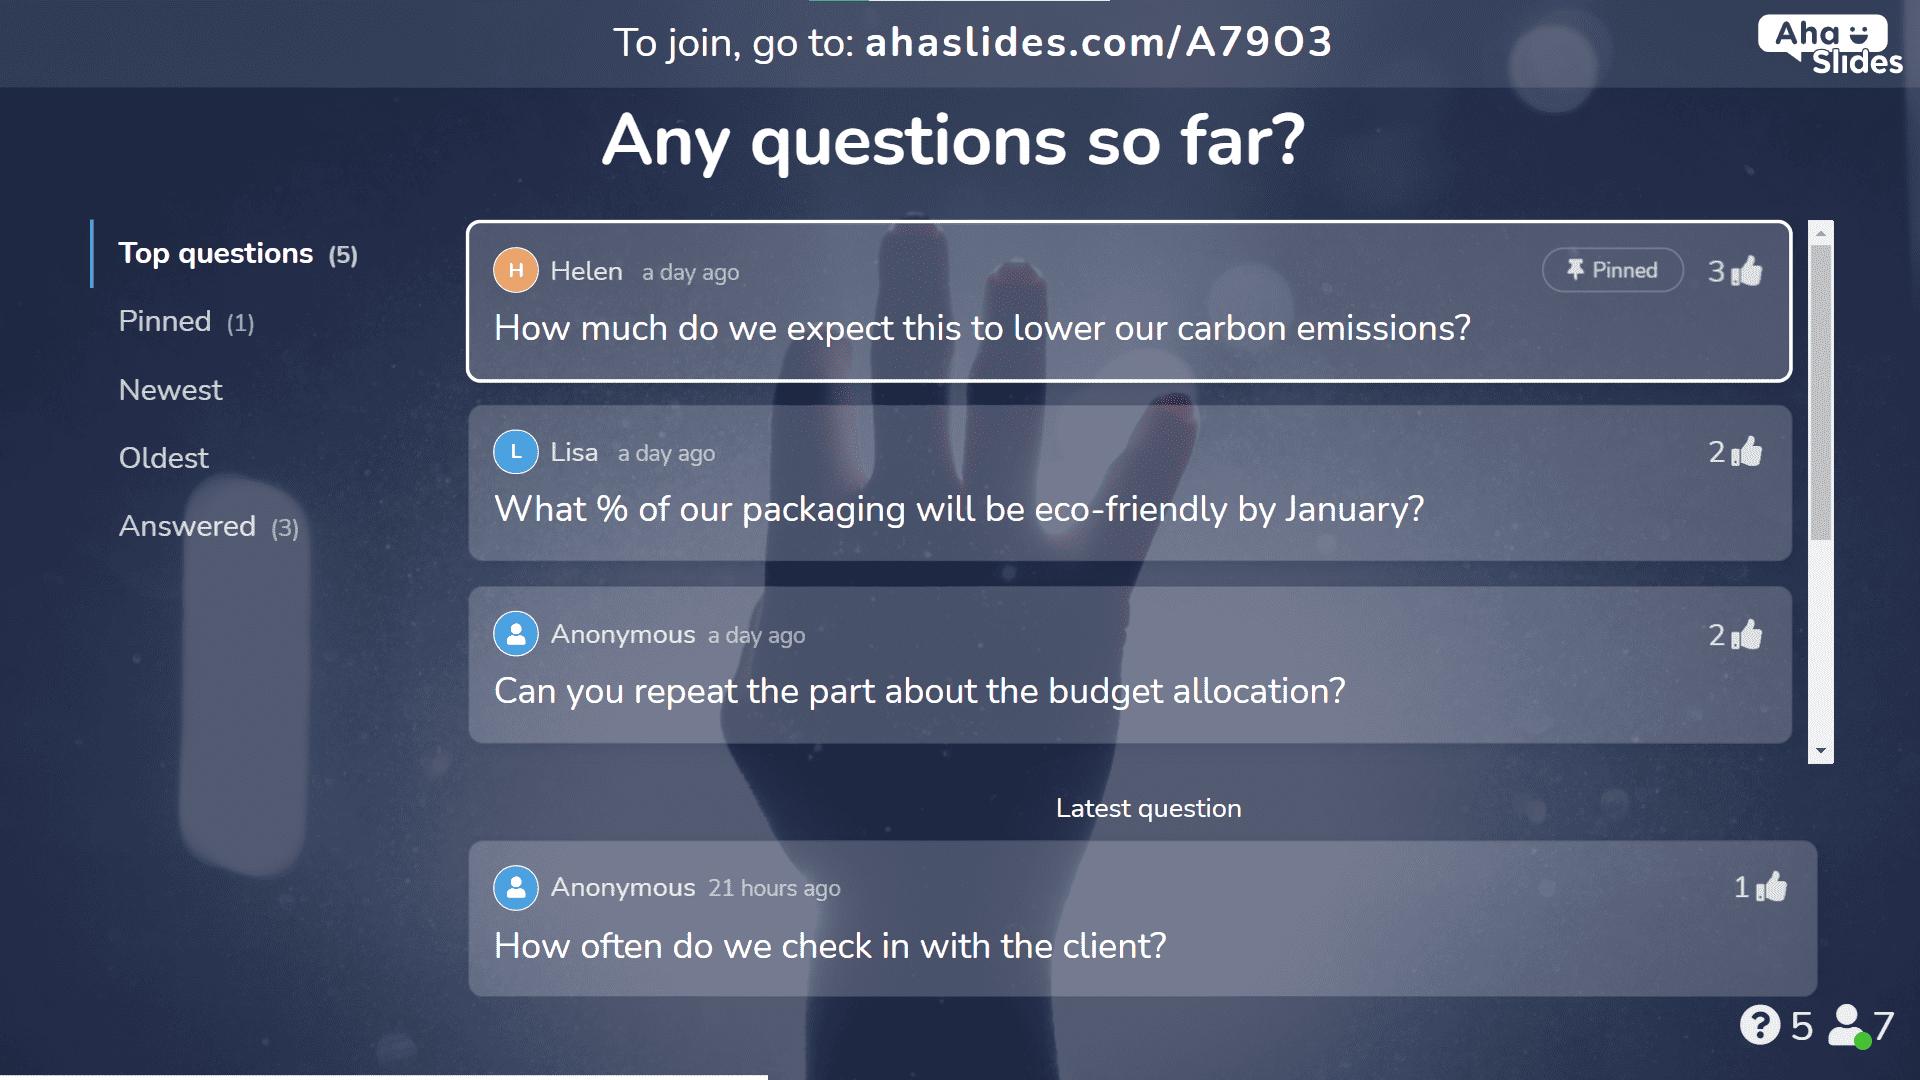 A Q&A slide on AhaSlides.